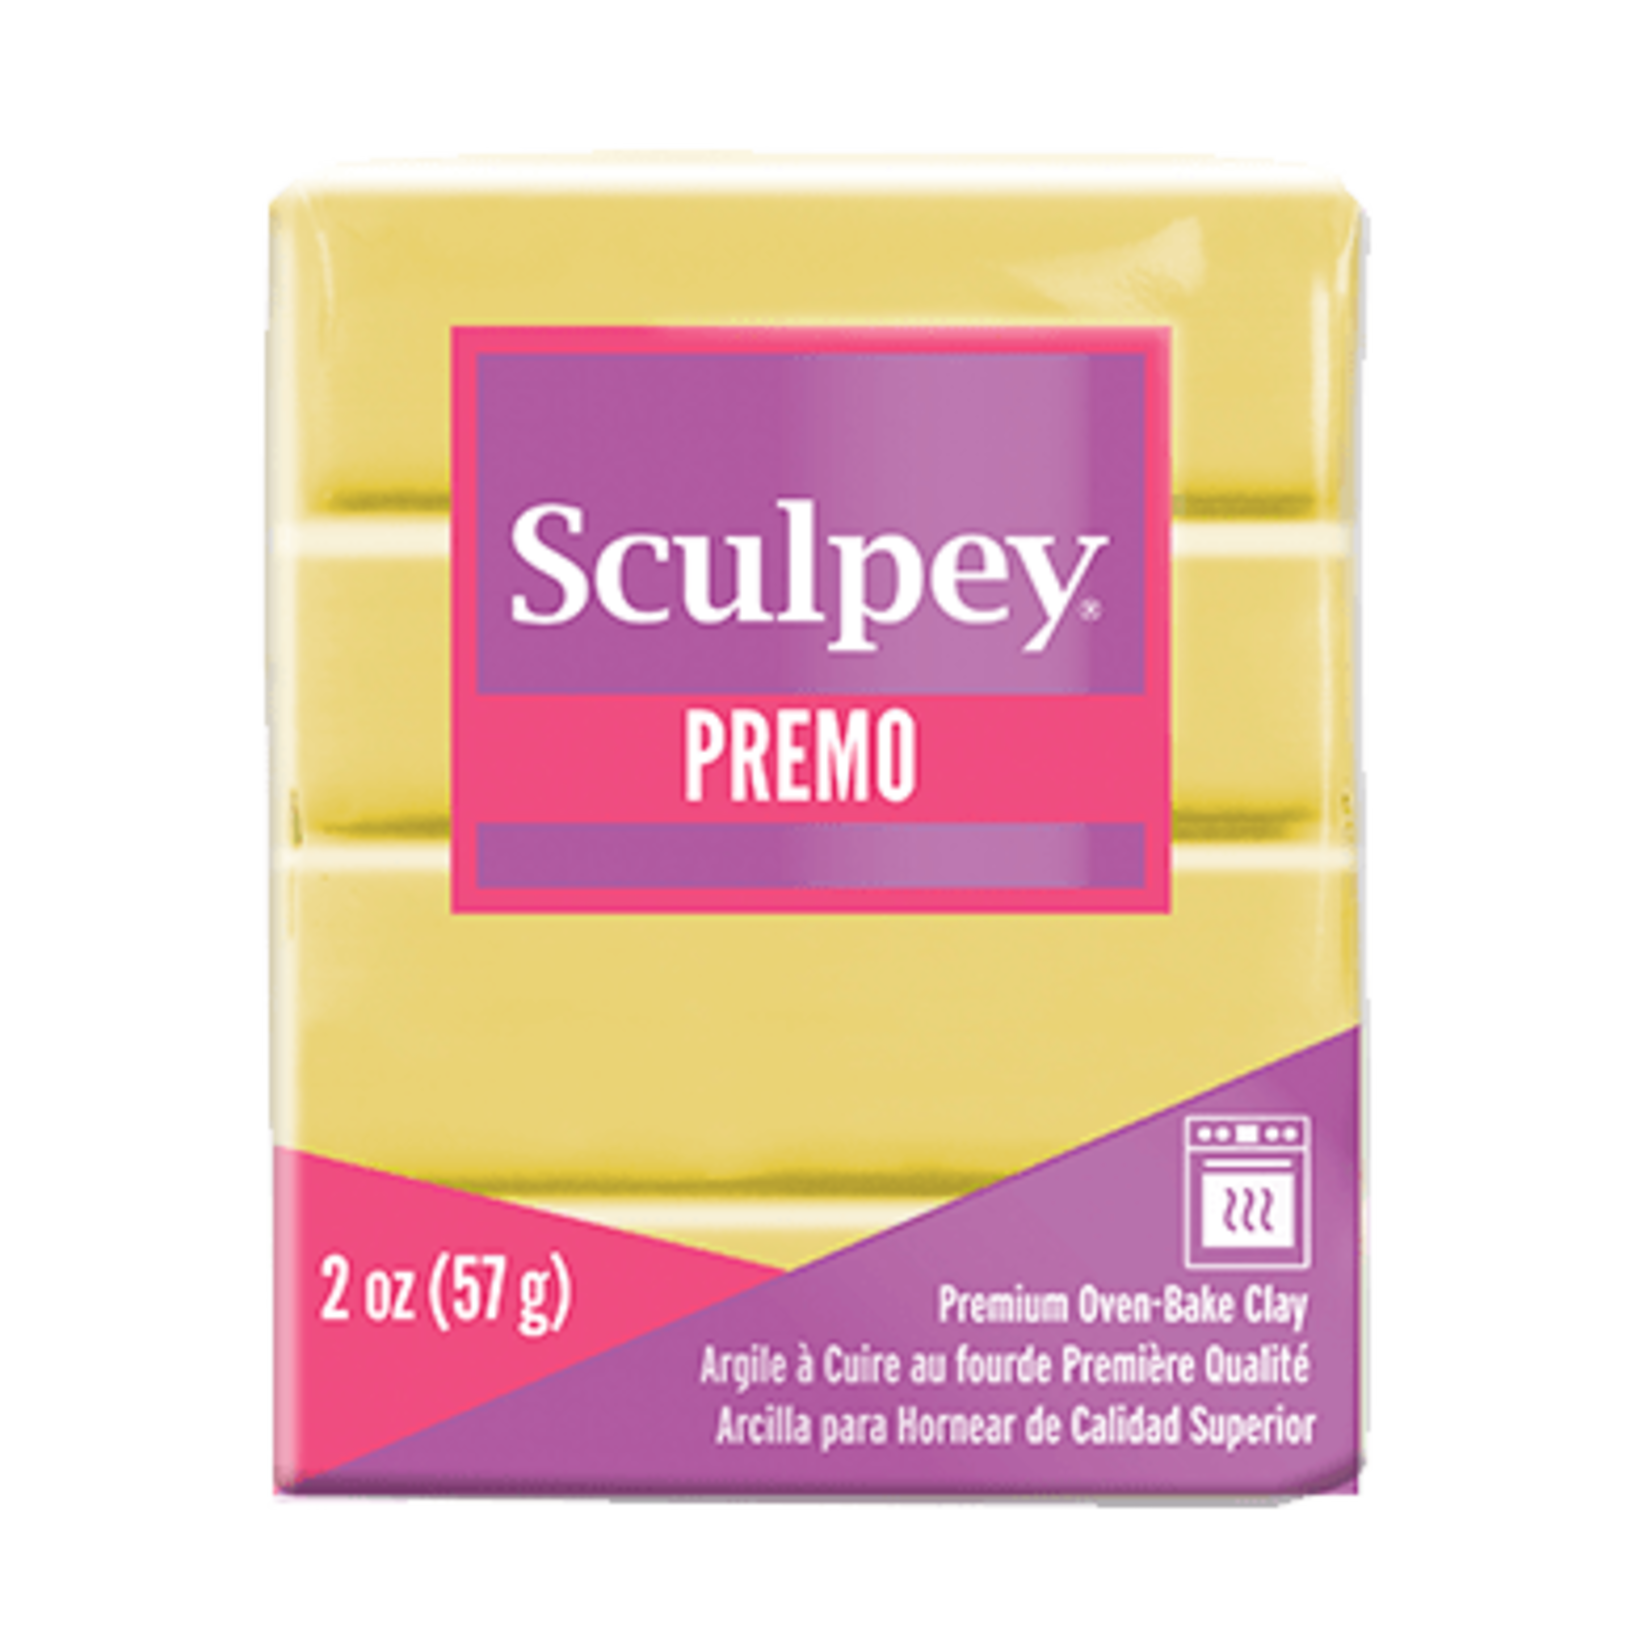 Sculpey Sculpey Premo  -- Flourescent Yellow